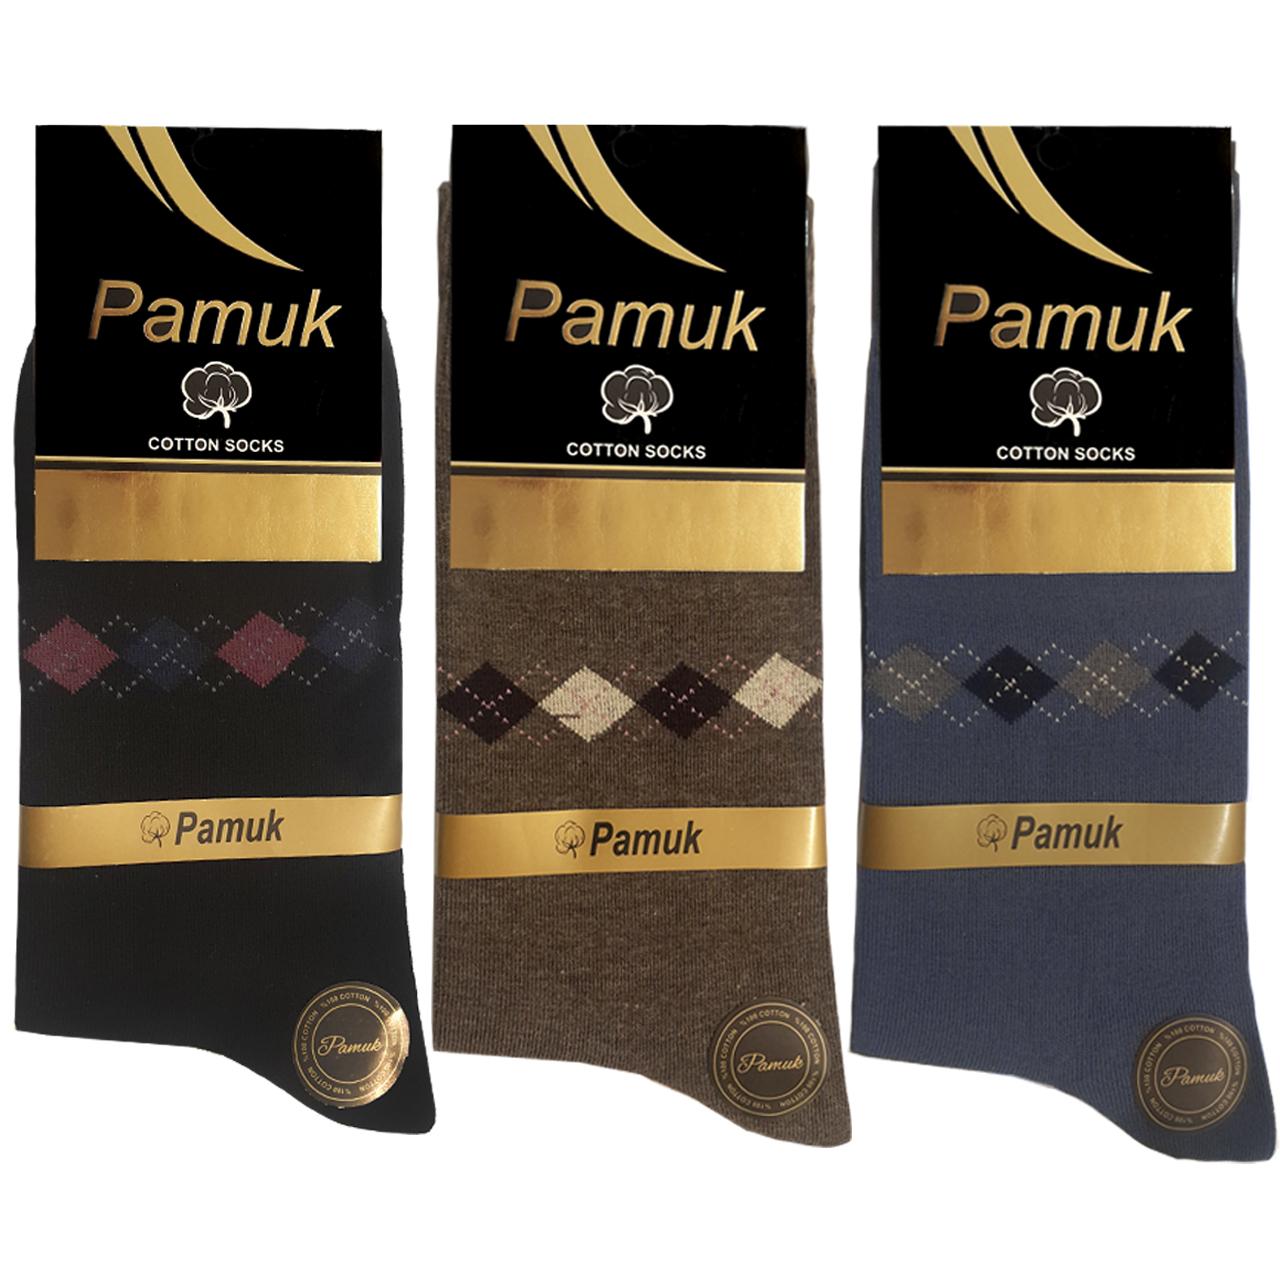 جوراب مردانه پاموک مدل 103.3 بسته ۳ عددی